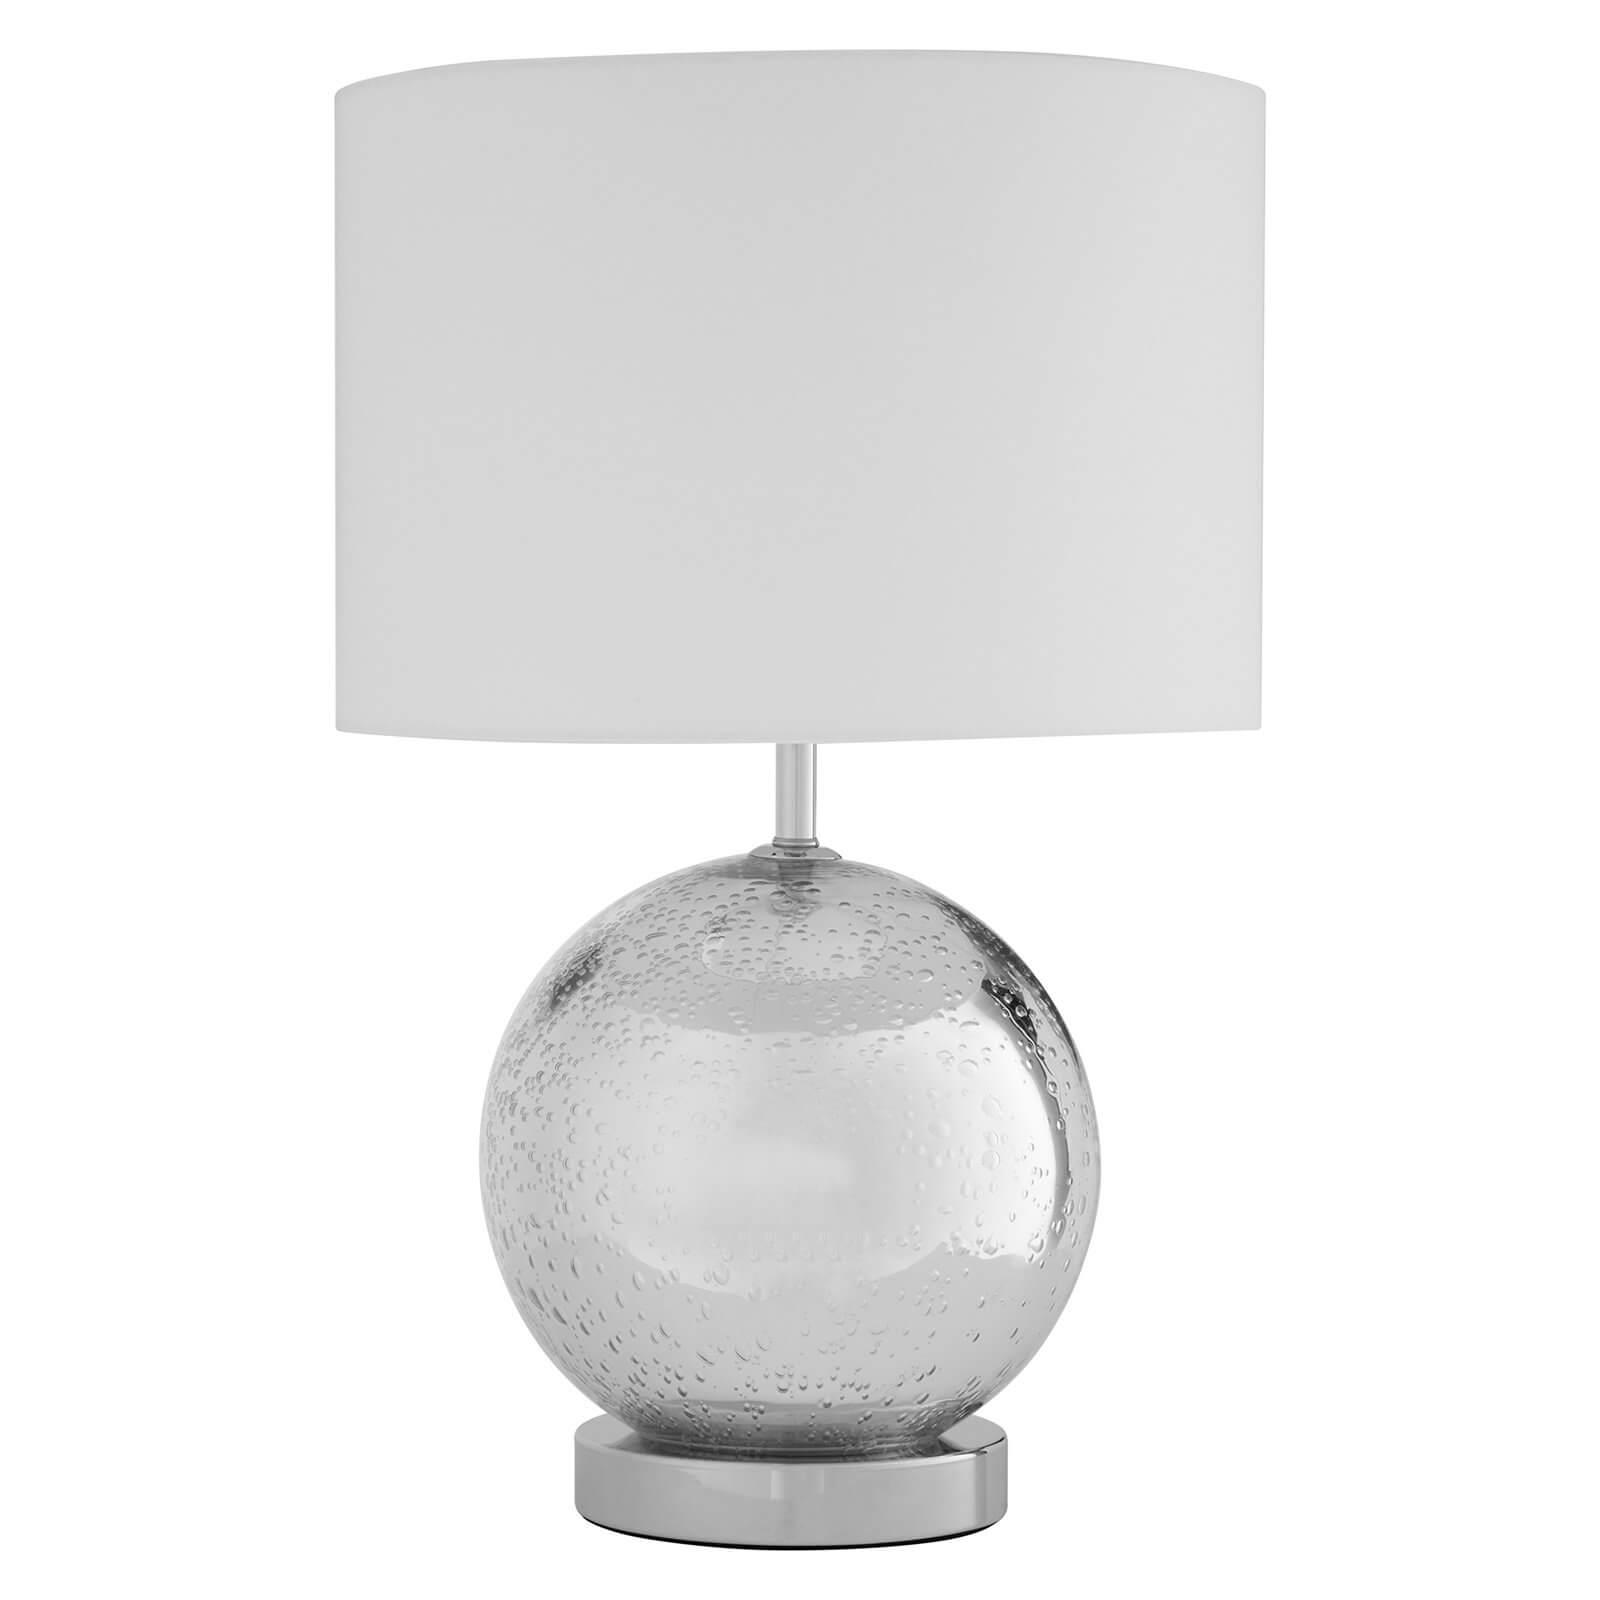 Naomi White Fabric Shade Table Lamp